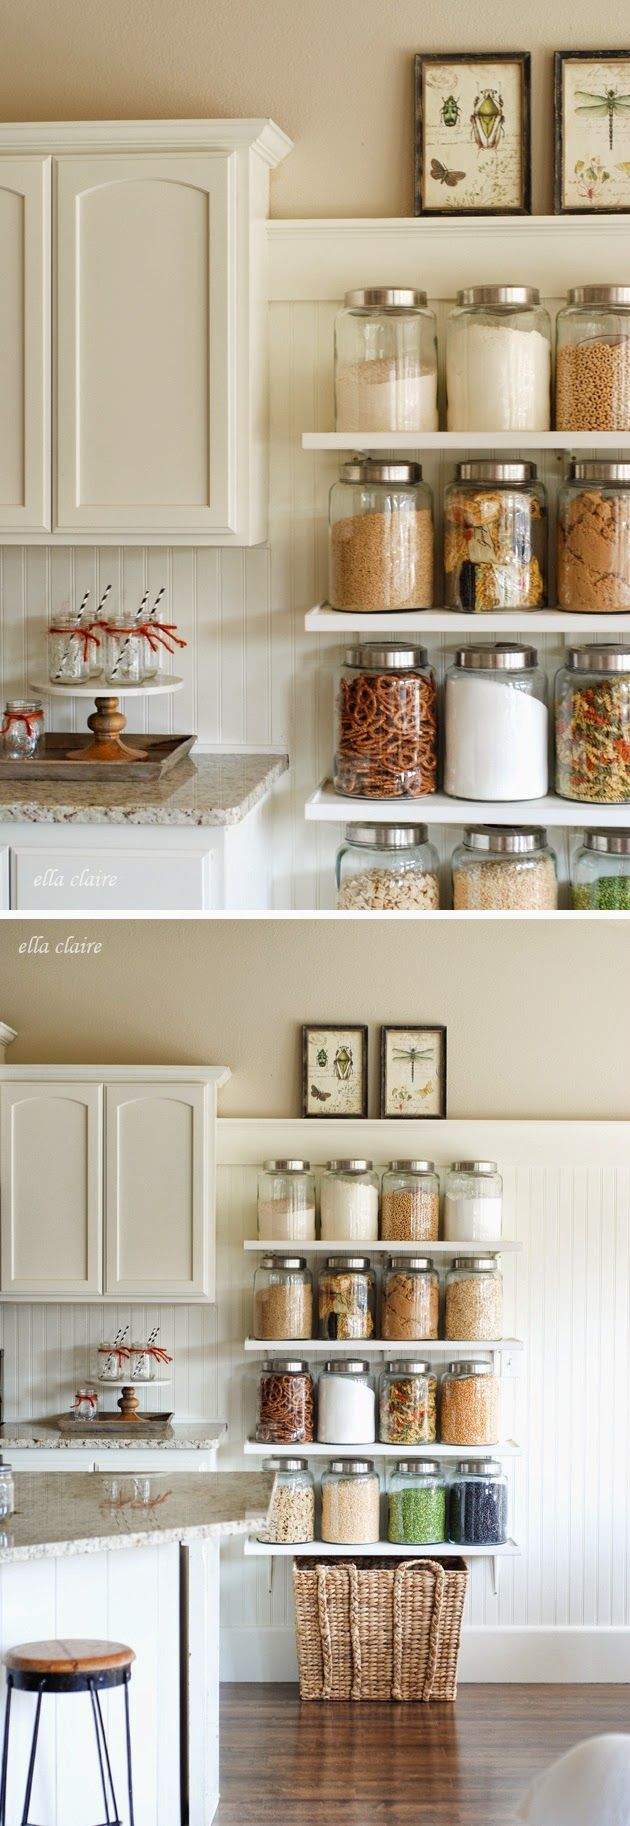 30 crazily simple diy tips to improve your kitchen glass 30 crazily simple diy tips to improve your kitchen architecture design solutioingenieria Gallery